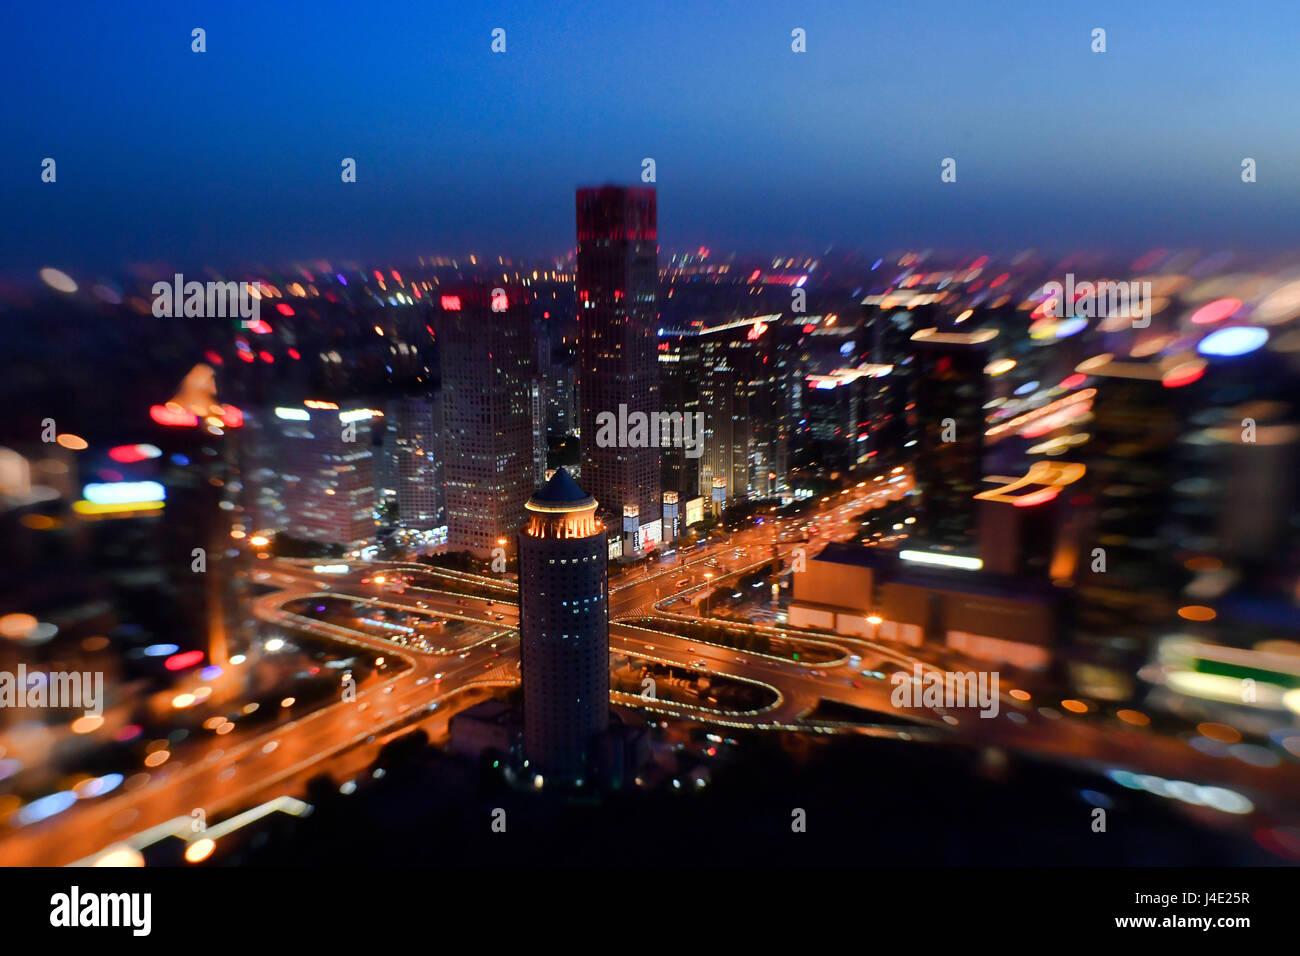 Fantastisch Landschaftsbeleuchtung Draht Fotos - Der Schaltplan ...